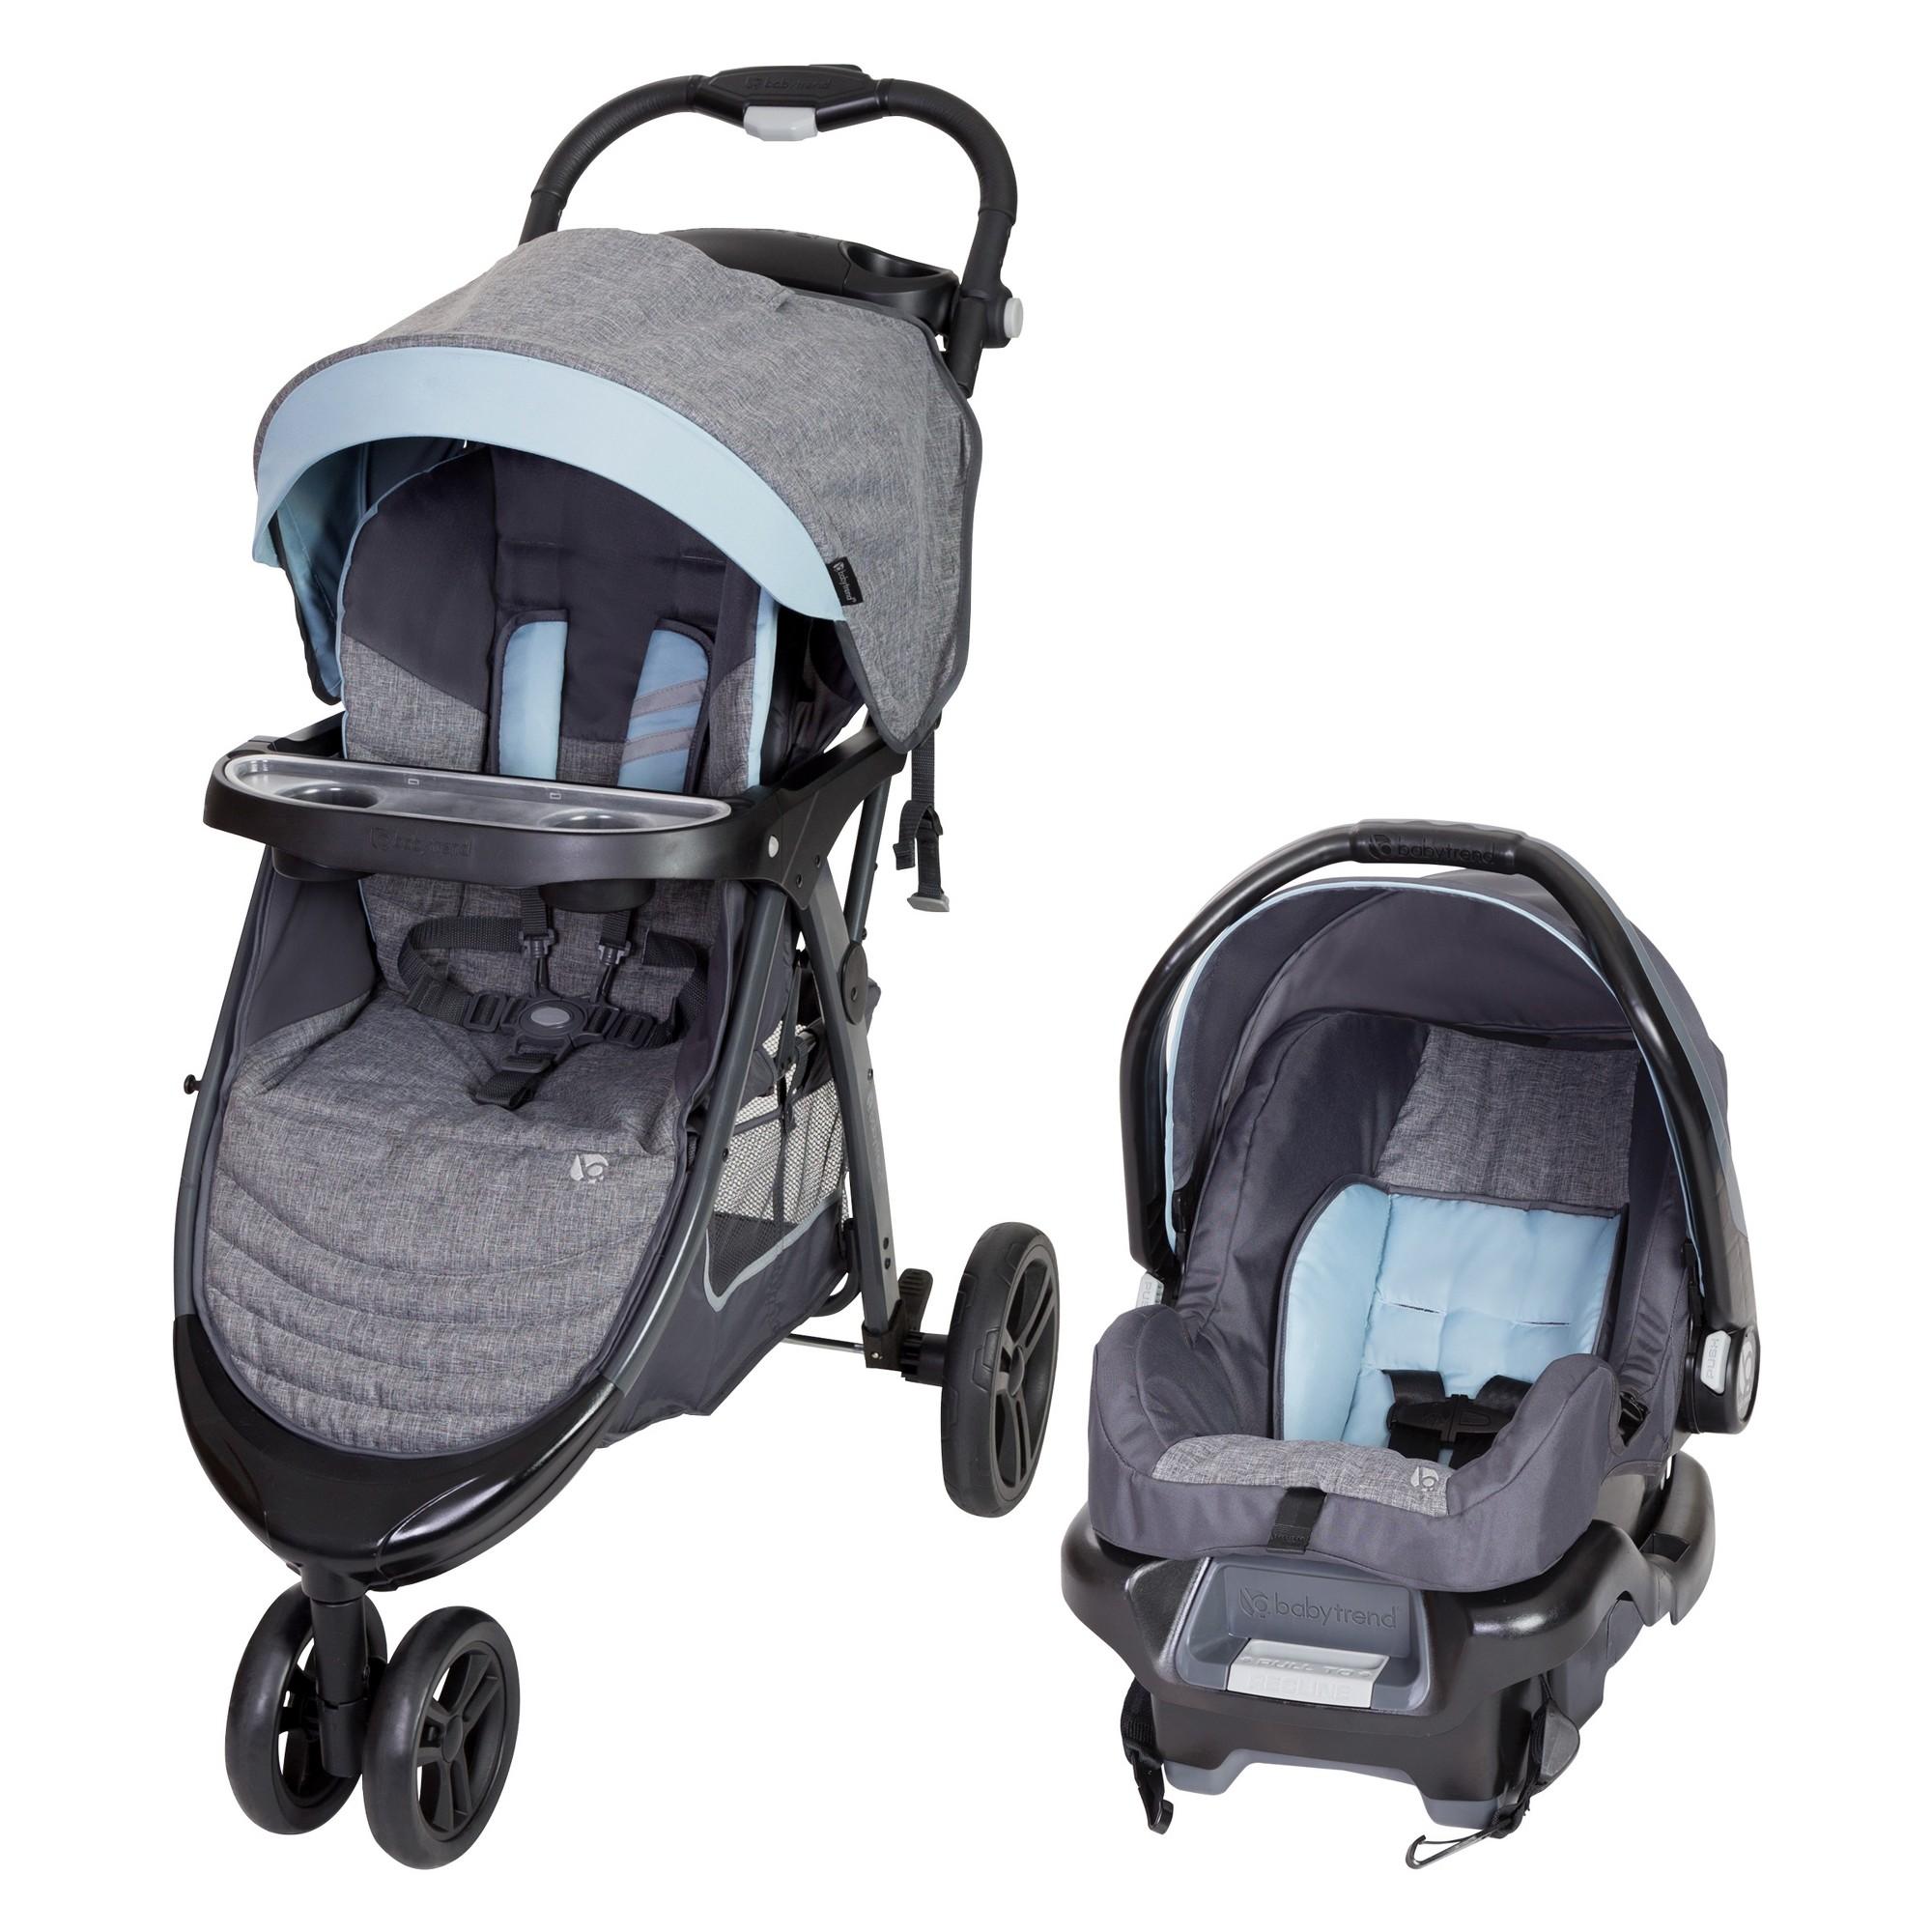 Baby Trend Skyline 35 Travel System